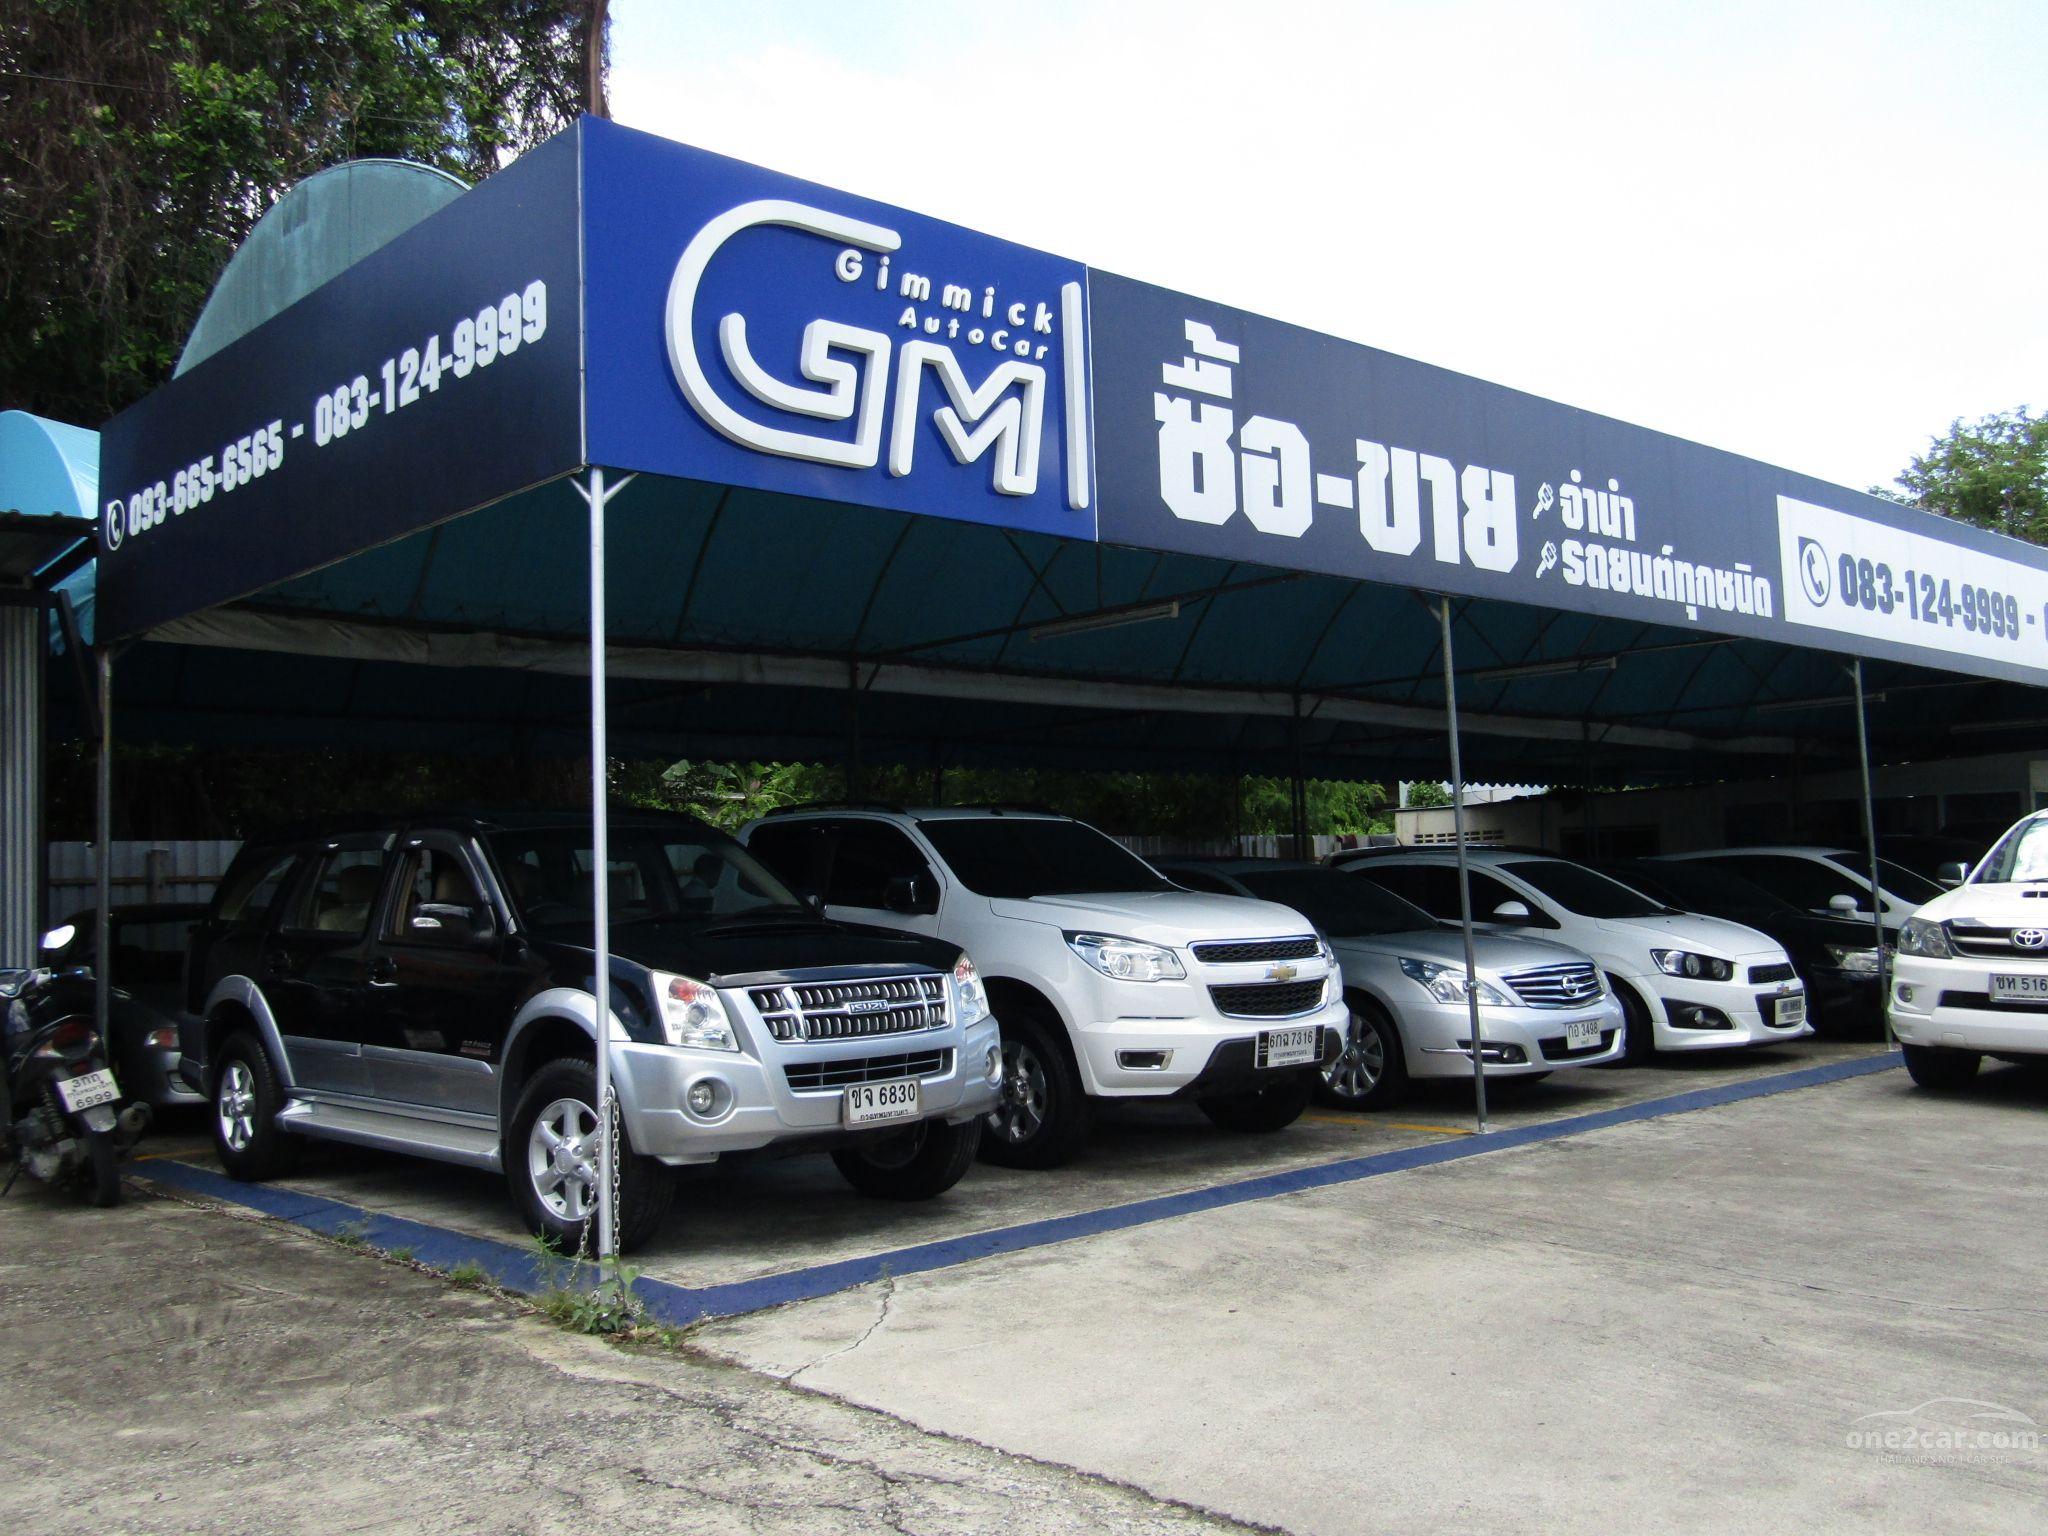 Gimmick Auto Car